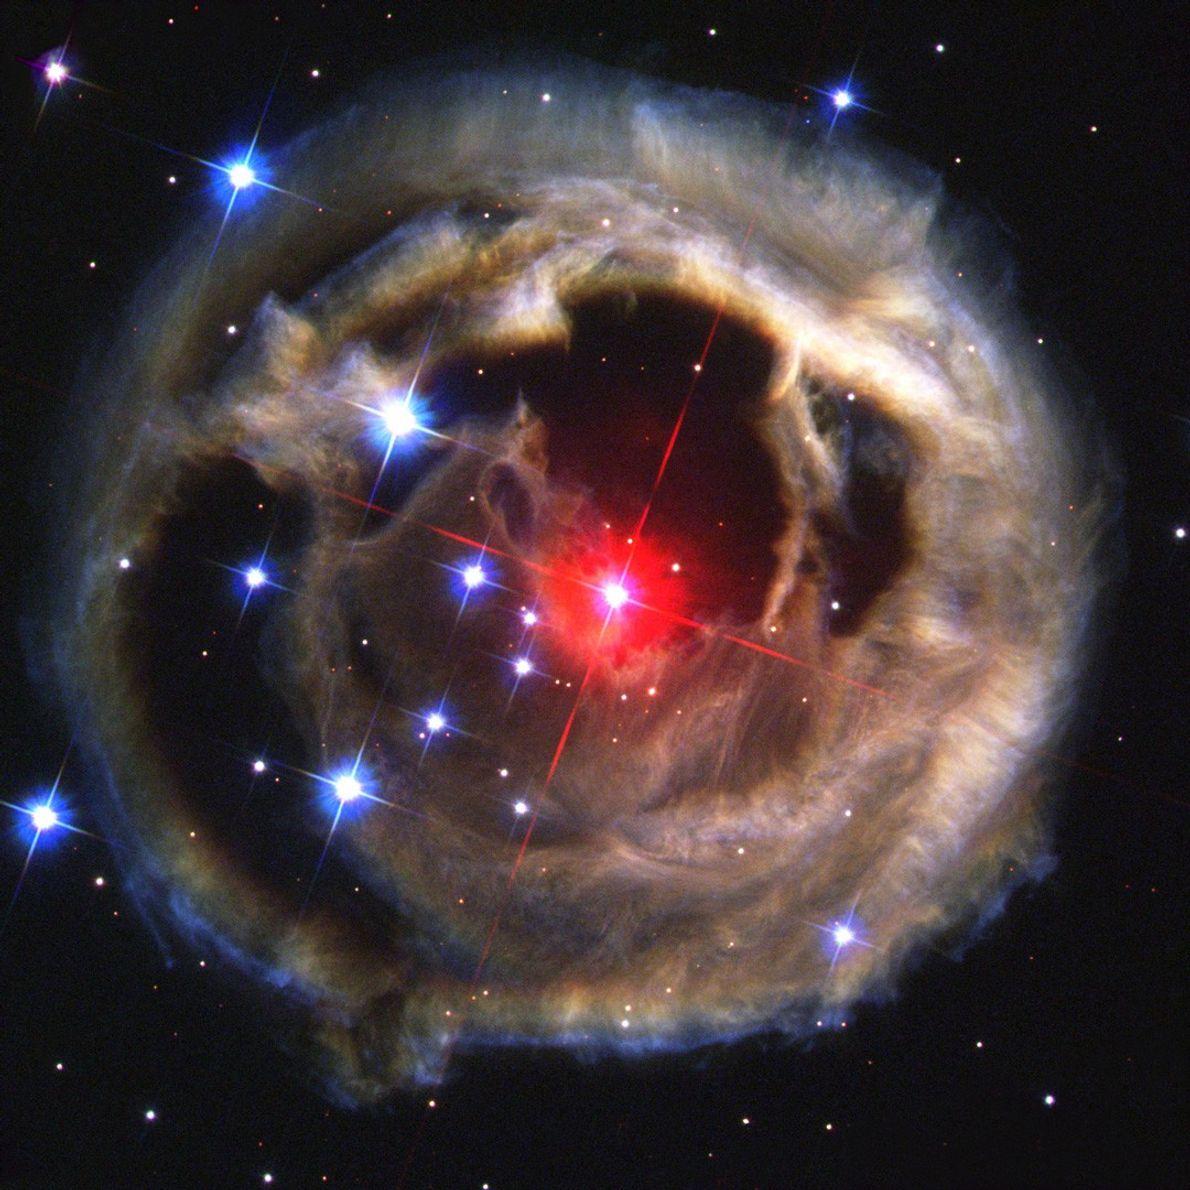 hubble-03-monocerotis-super-gigante-vermelha